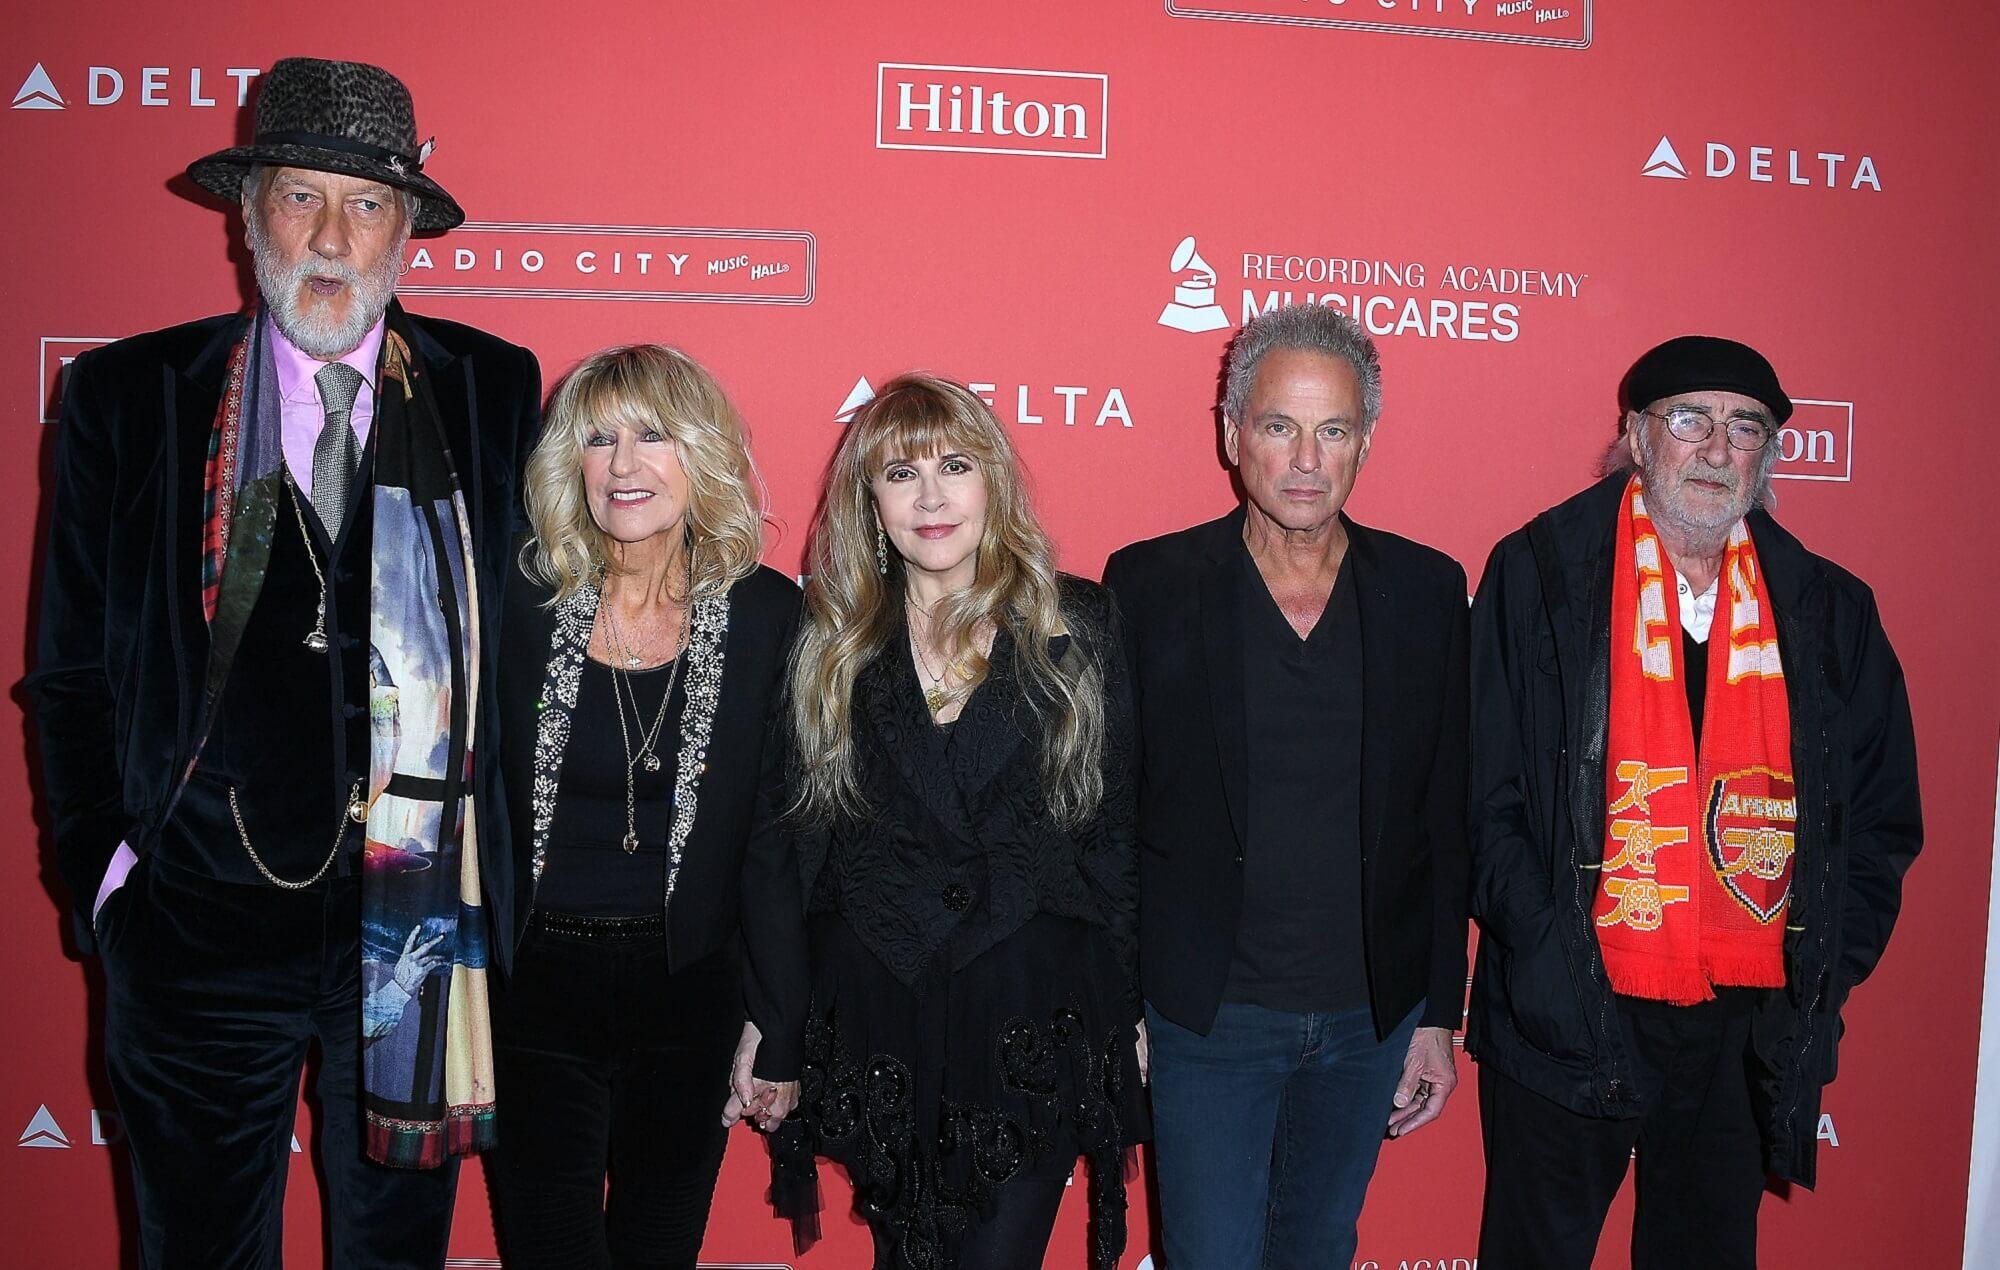 Mick Fleetwood, Christine McVie, Stevie Nicks, Lindsey Buckingham, and John McVie of Fleetwood Mac in 2018.